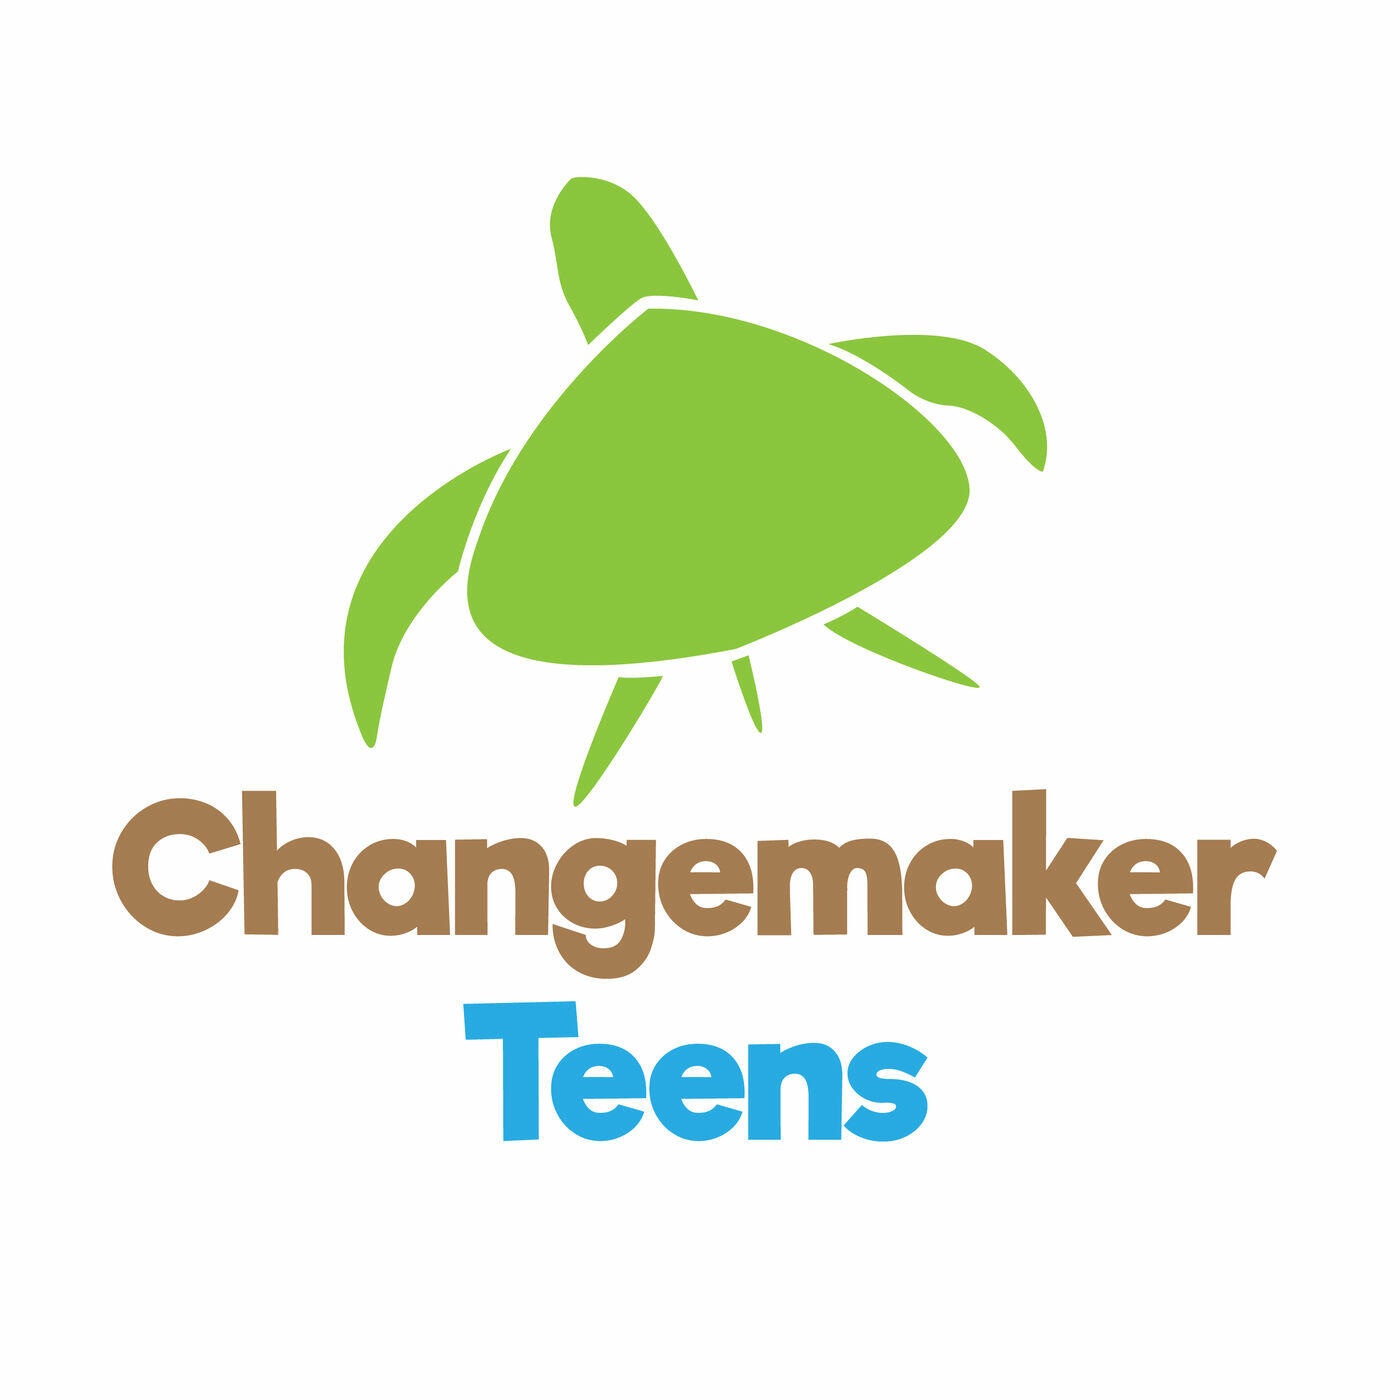 Changemaker Teens